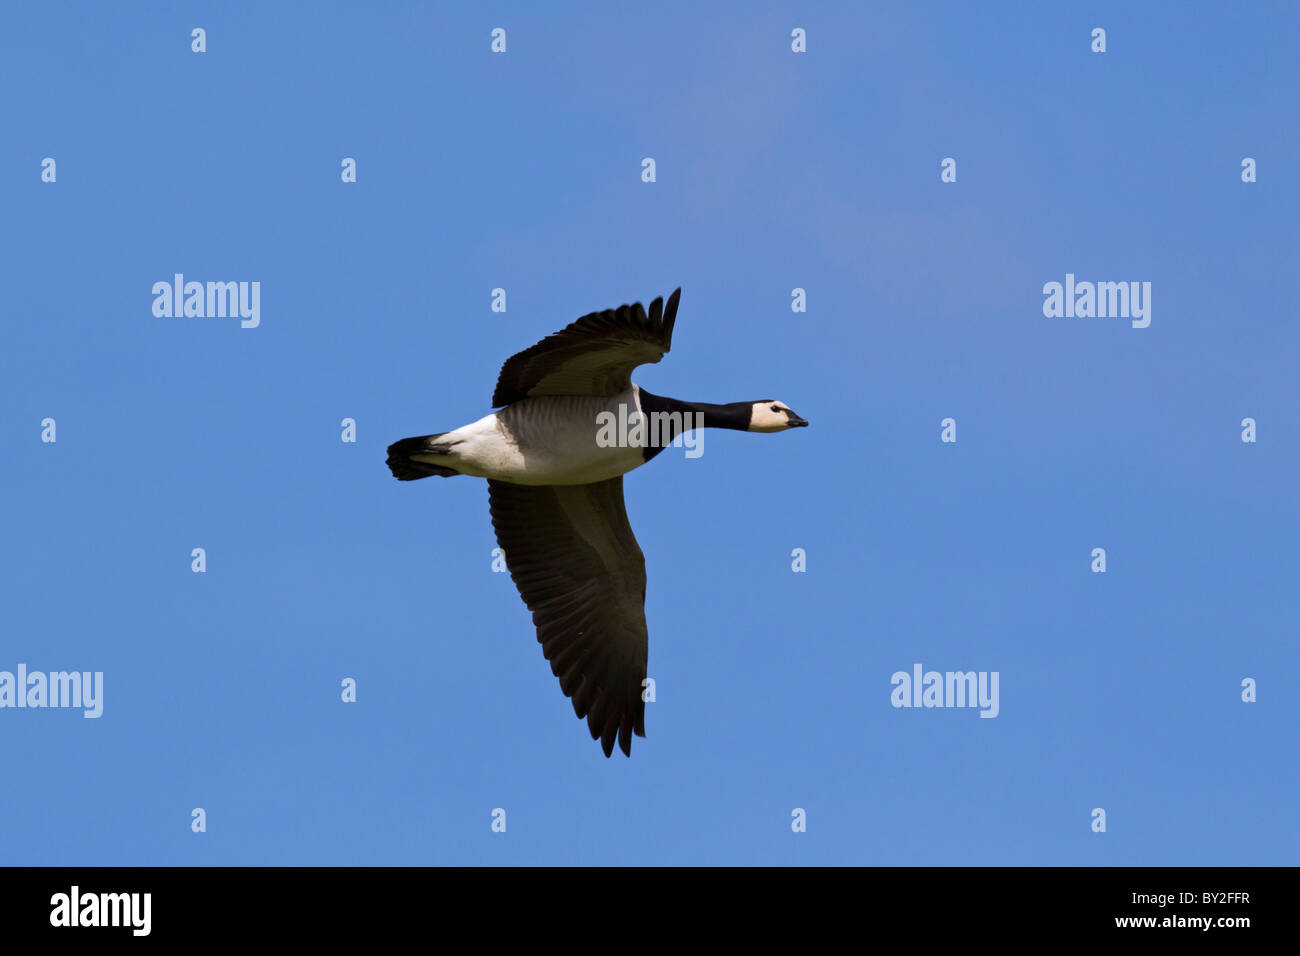 Brandgans (Branta leucopsis) vliegend, Duitsland Barnacle Goose (Branta leucopsis) in flight, Germany - Stock Image